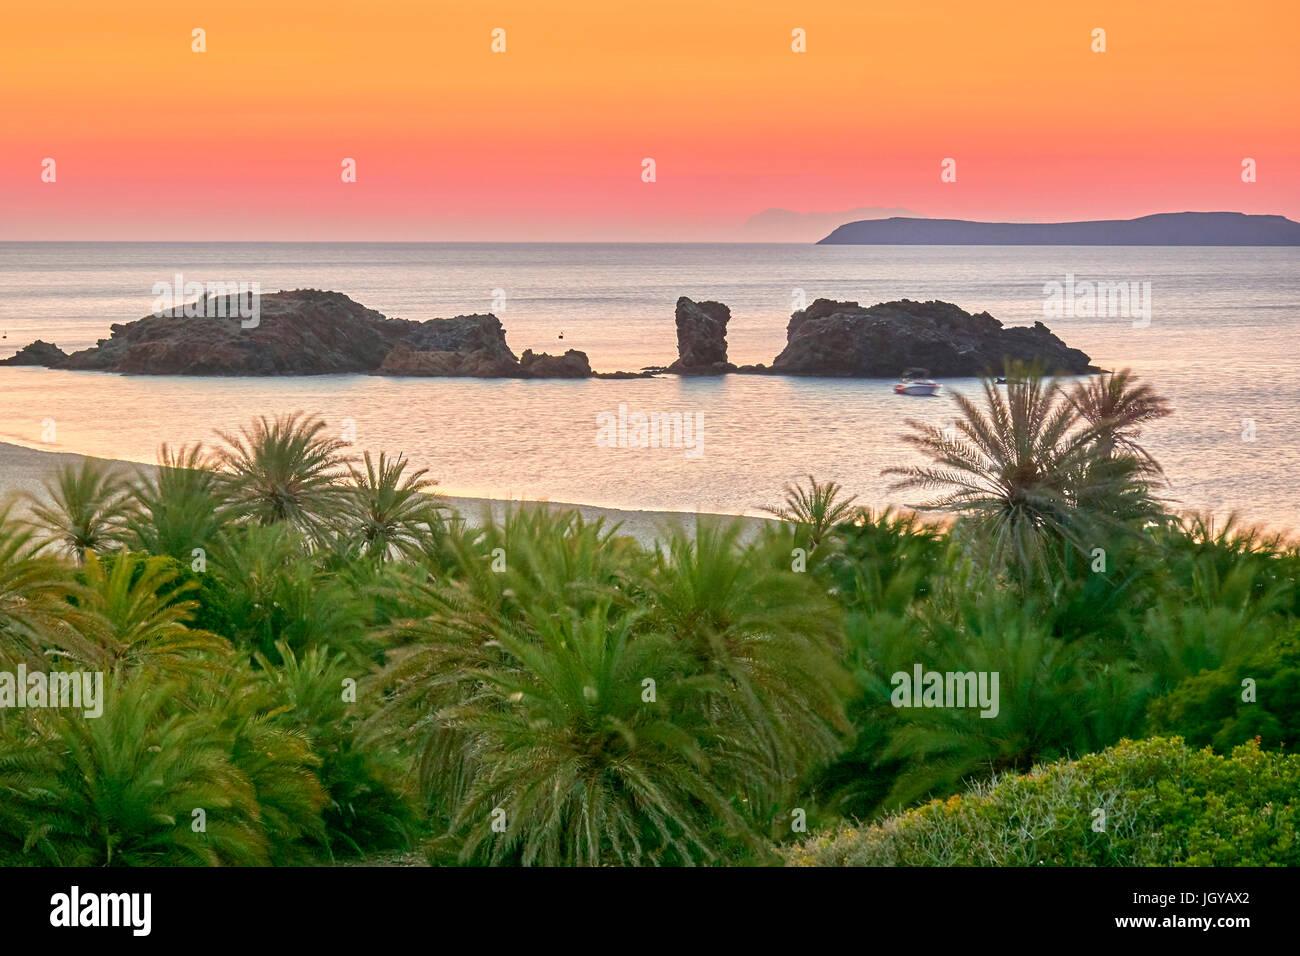 Dusk before sunrise at Vai Beach, Crete Island, Greece - Stock Image